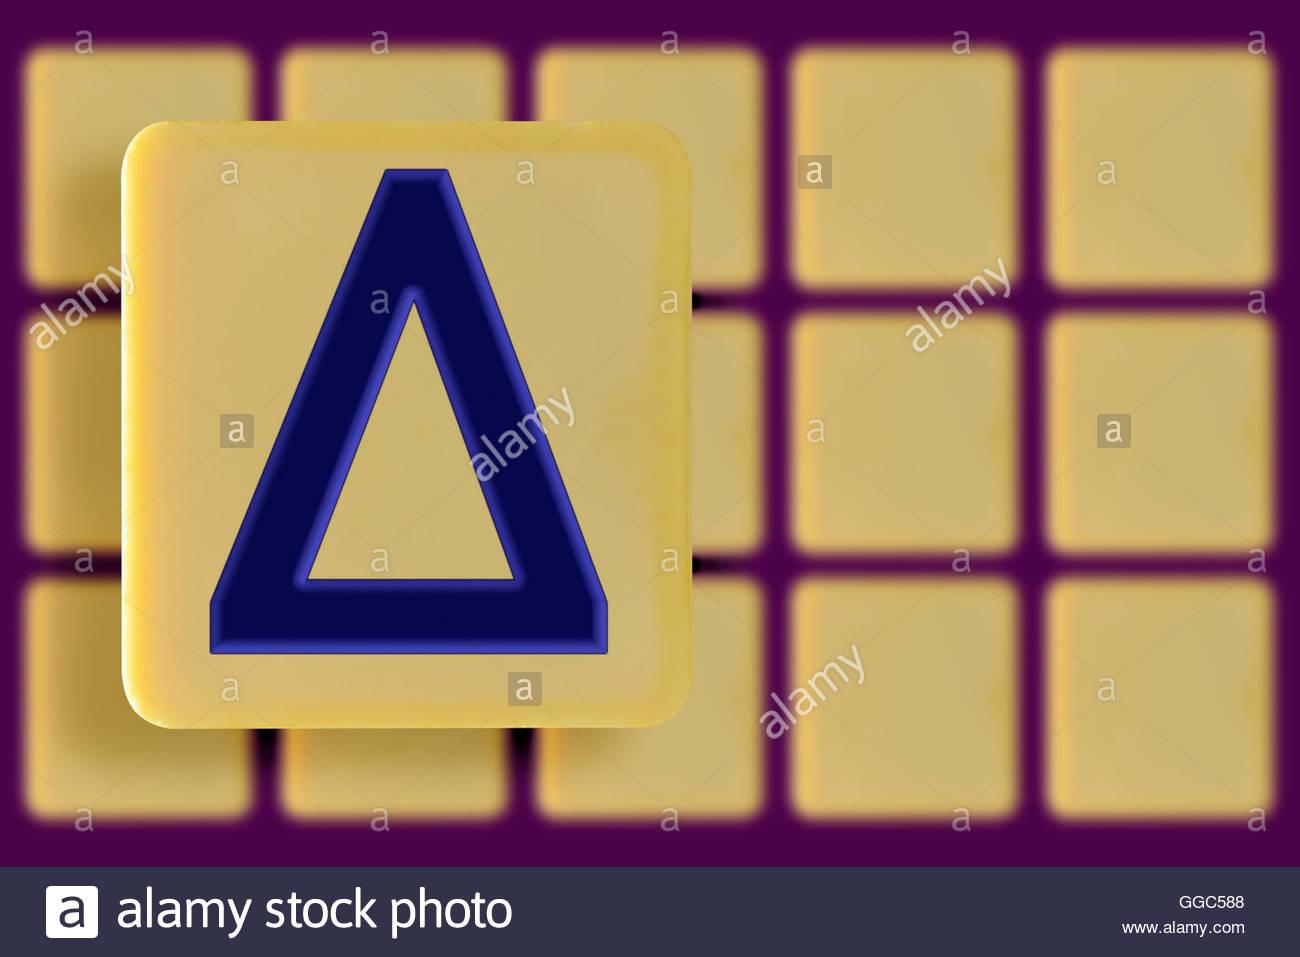 Delta symbol on an alphabet tile dorset england britain uk delta symbol on an alphabet tile dorset england britain uk biocorpaavc Choice Image